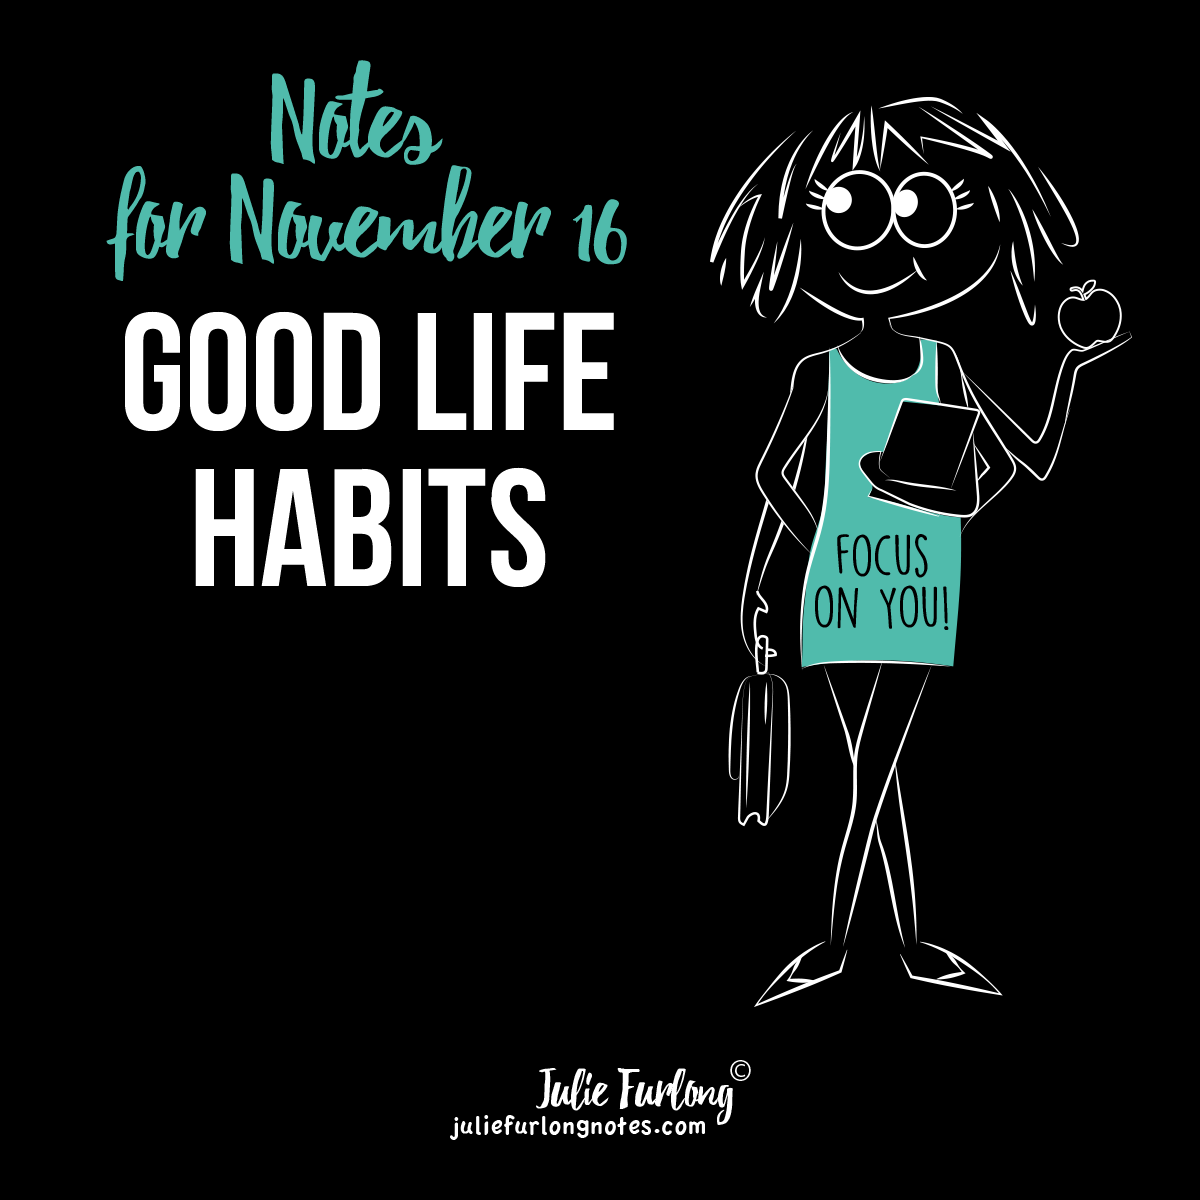 Julie-Furlong-Notes-good-life-habit